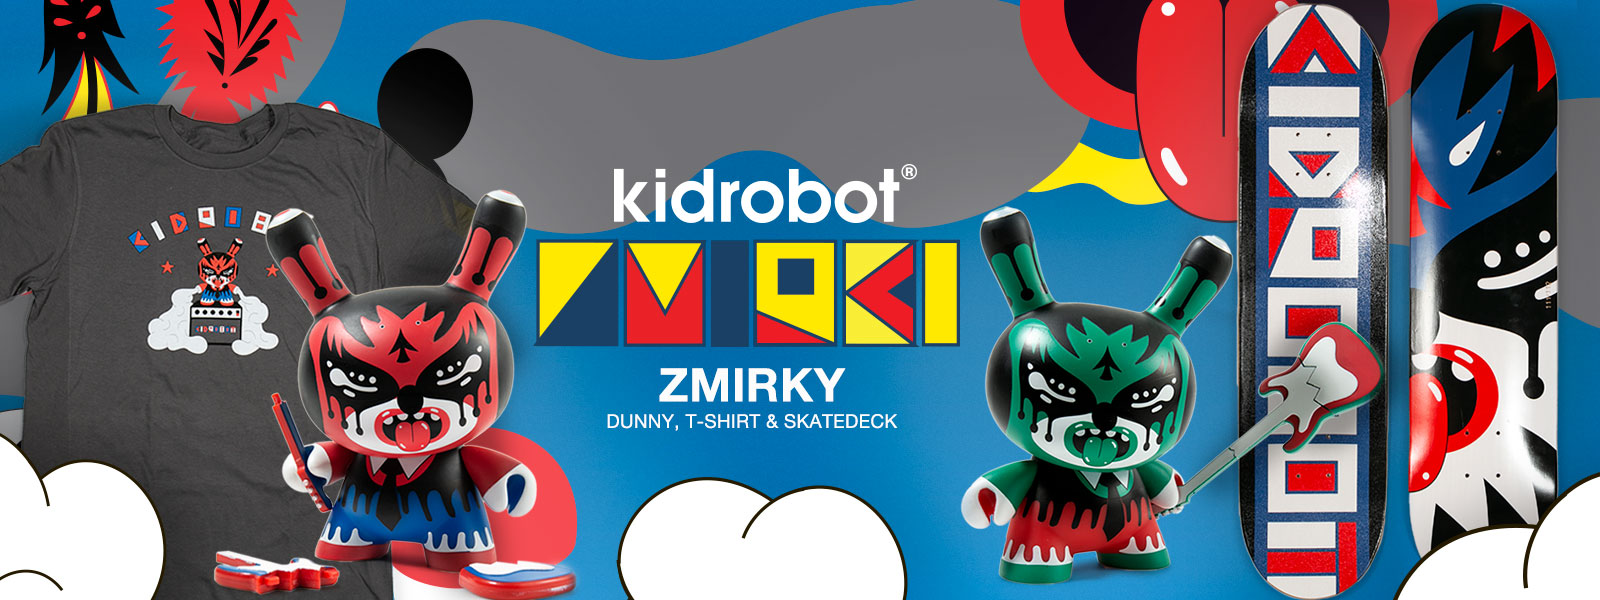 "Zmirky 5"" Dunny Artist Capsule by Roman Klonek and Kidrobot"